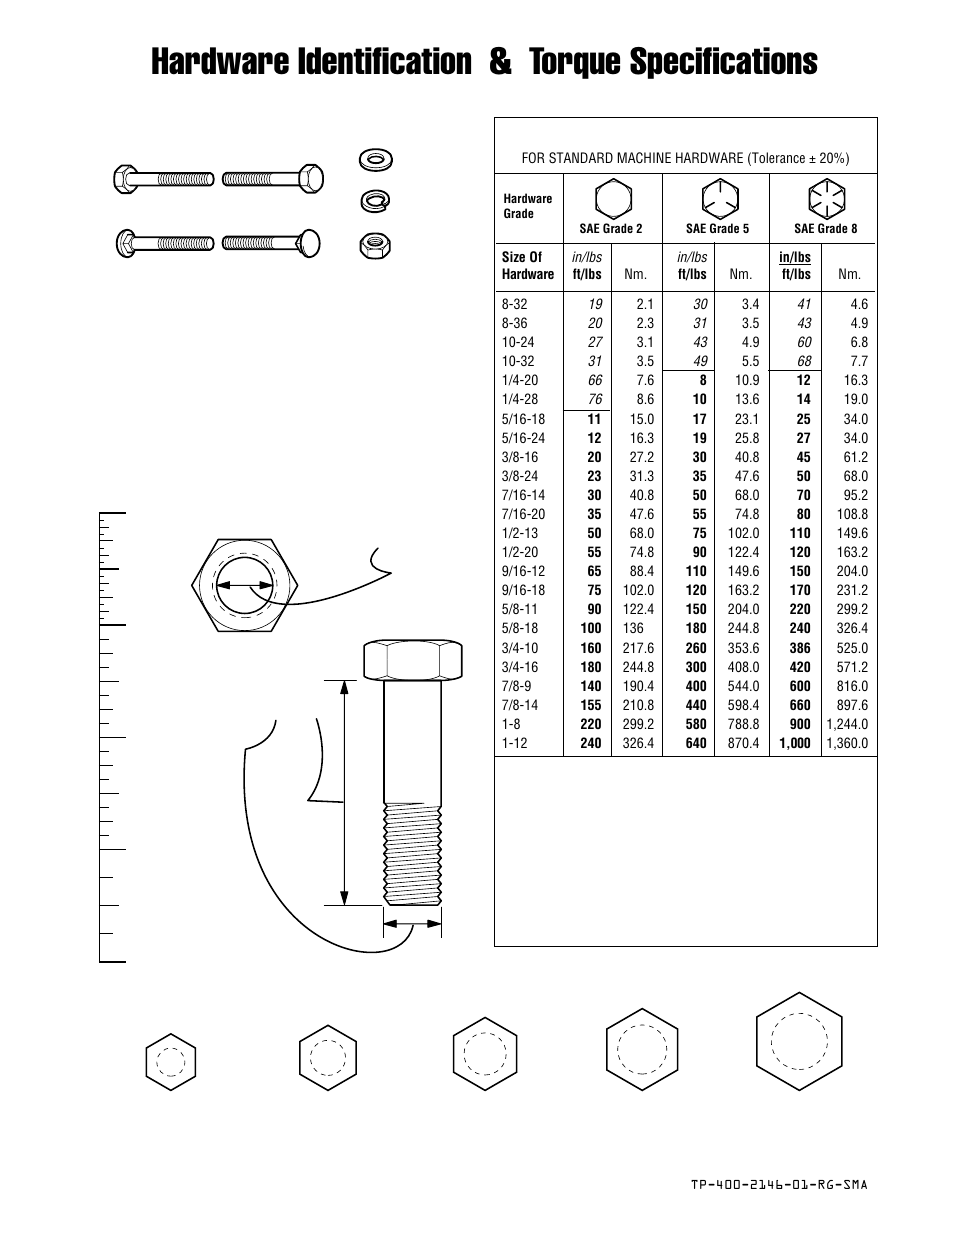 Hardware identification & torque specifications, Torque